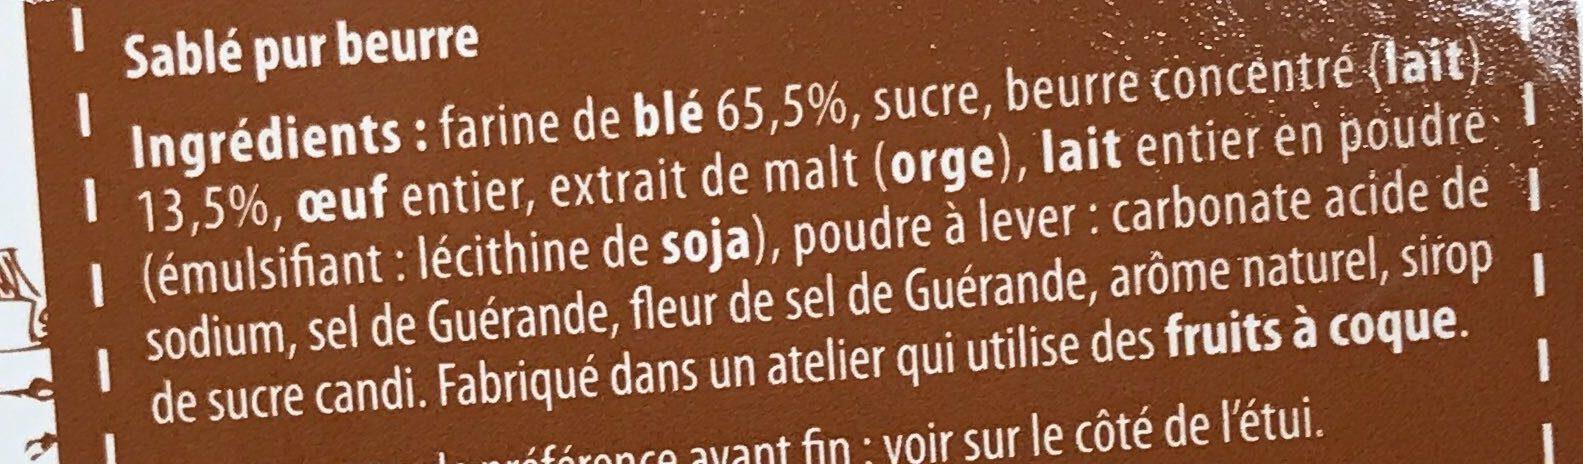 Sablé de France Pur Beurre - Ingrediënten - fr